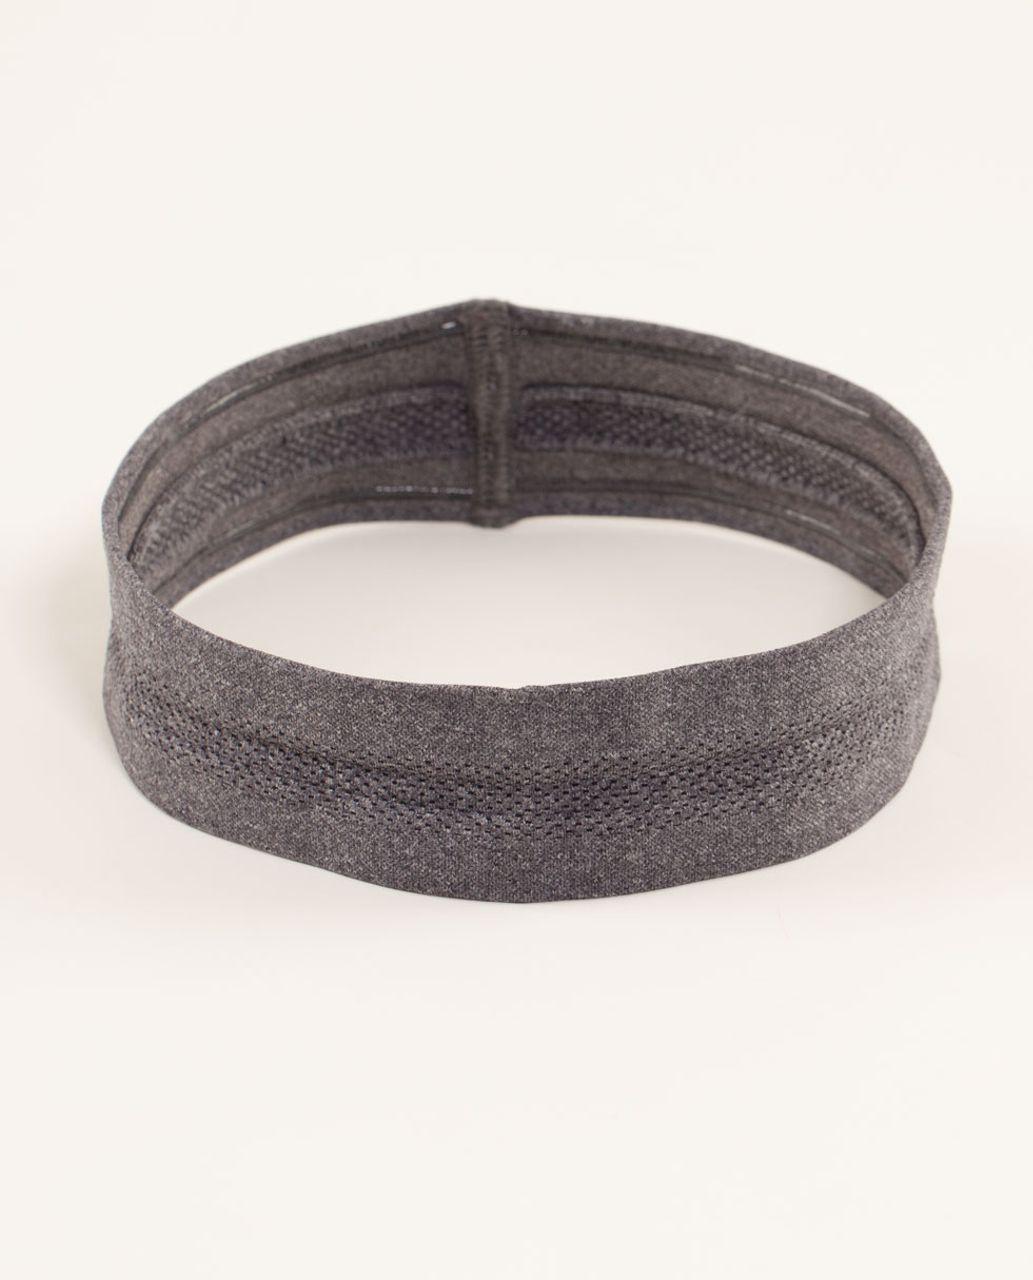 Lululemon Swiftly Headband - Black